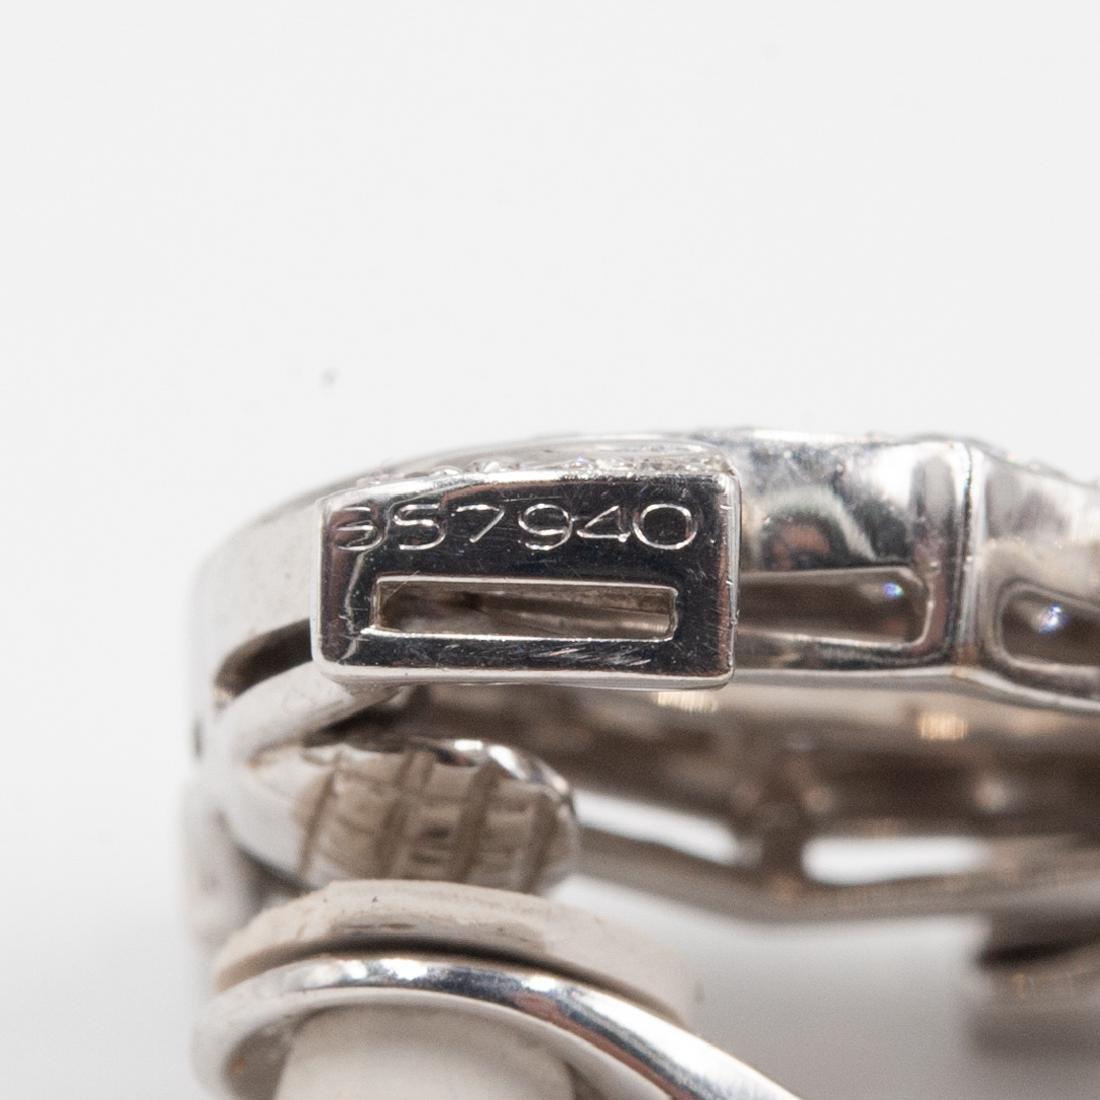 Pair of 18K Cartier C de Cartier Diamond Earrings - 4